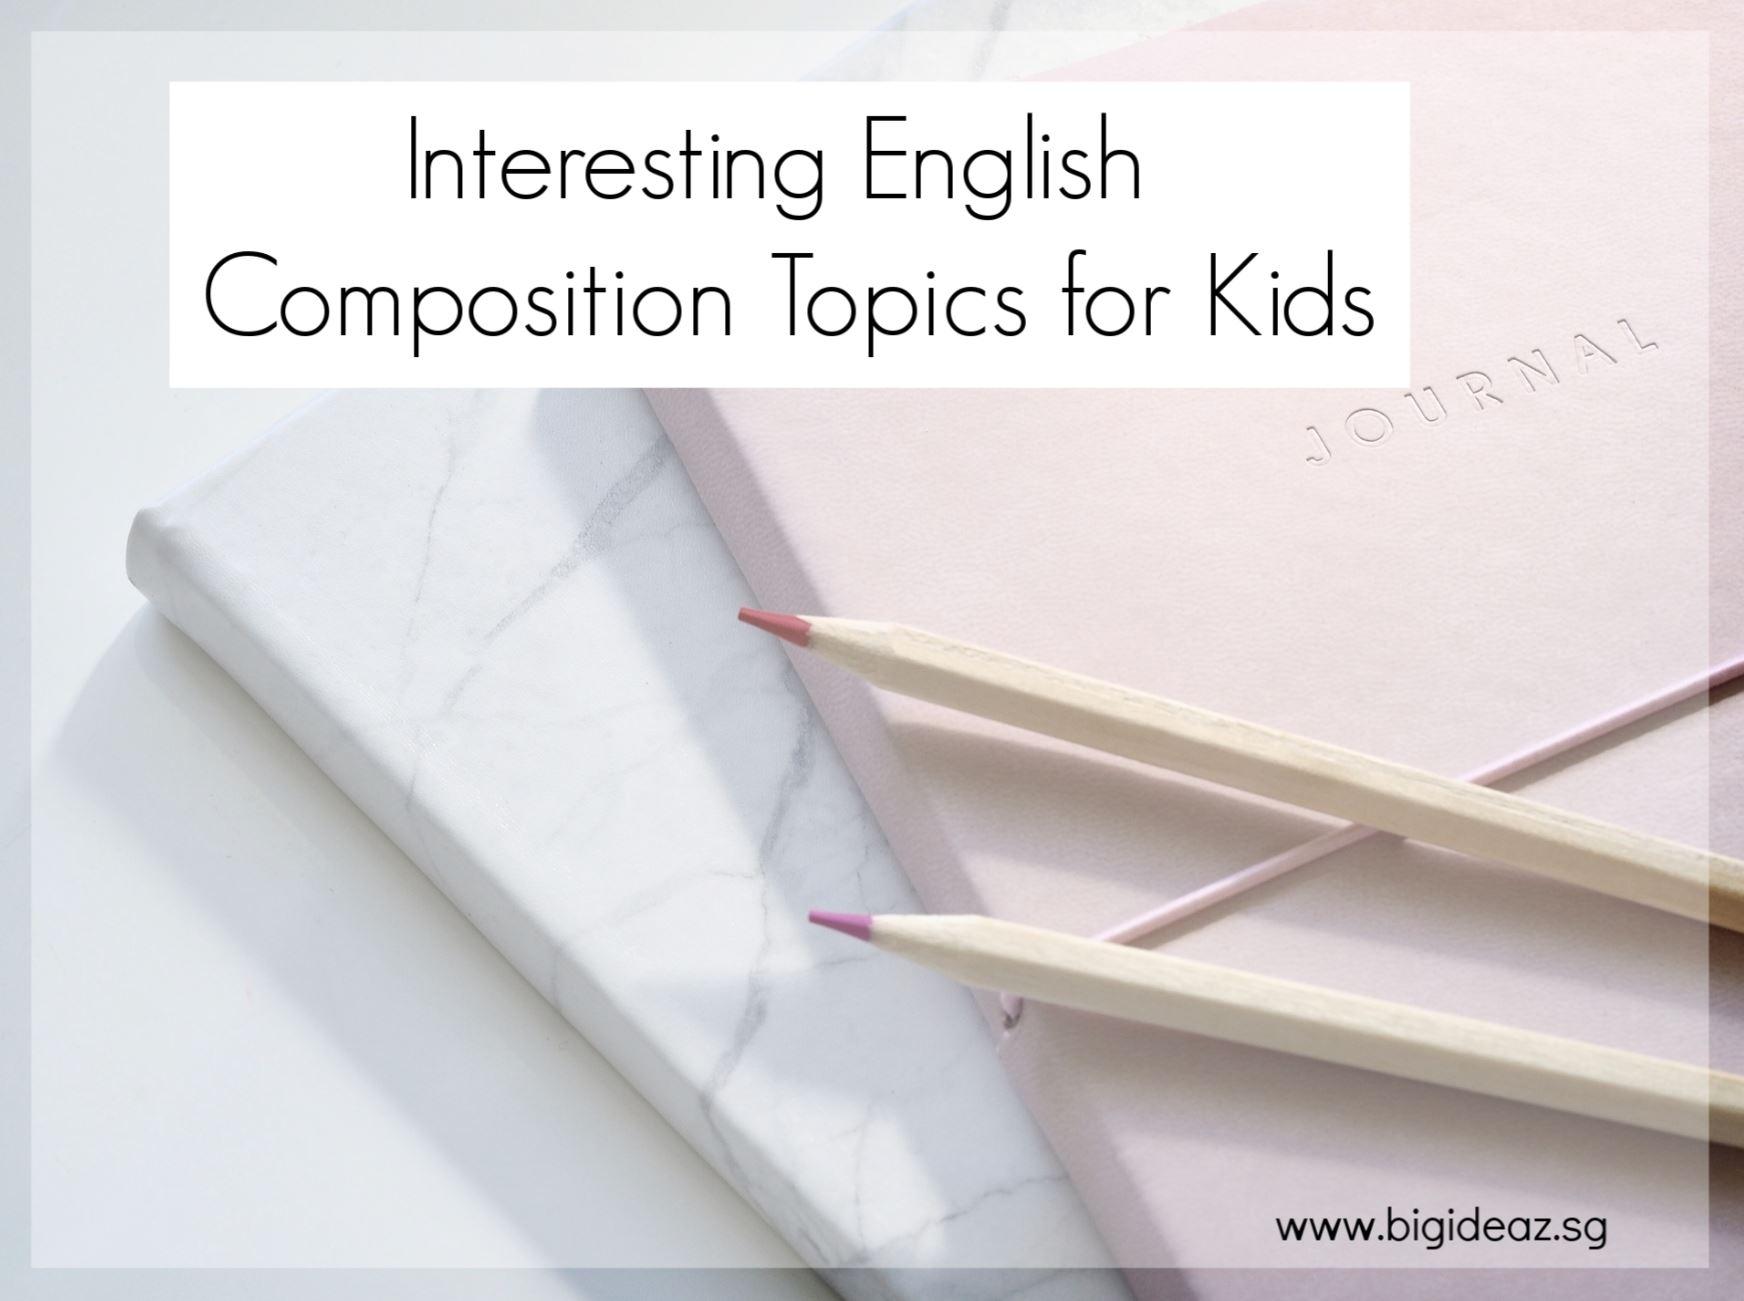 English composition topics